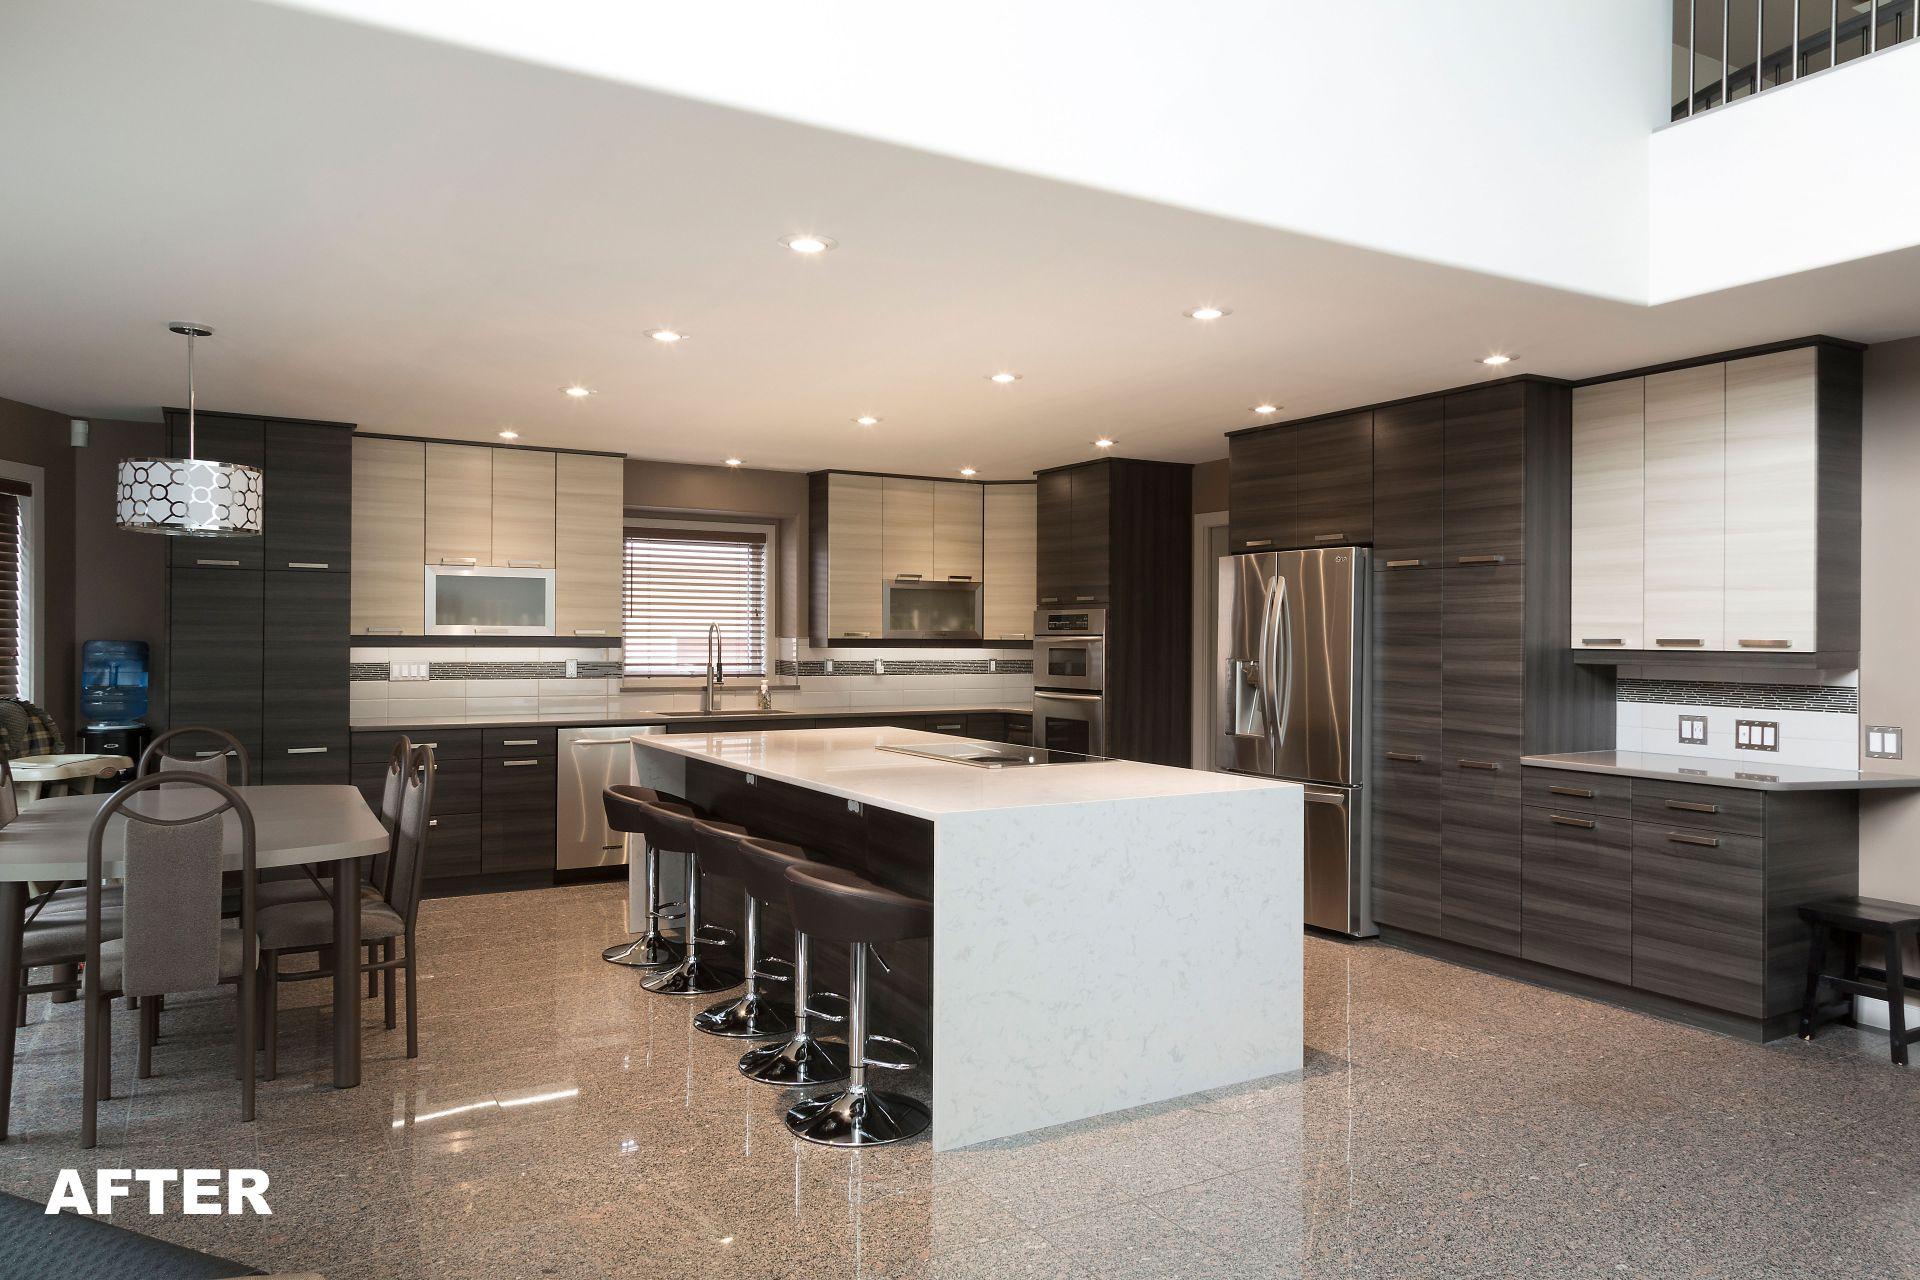 kitchen refacing farm decor welcome to nu life kitchens testimonials